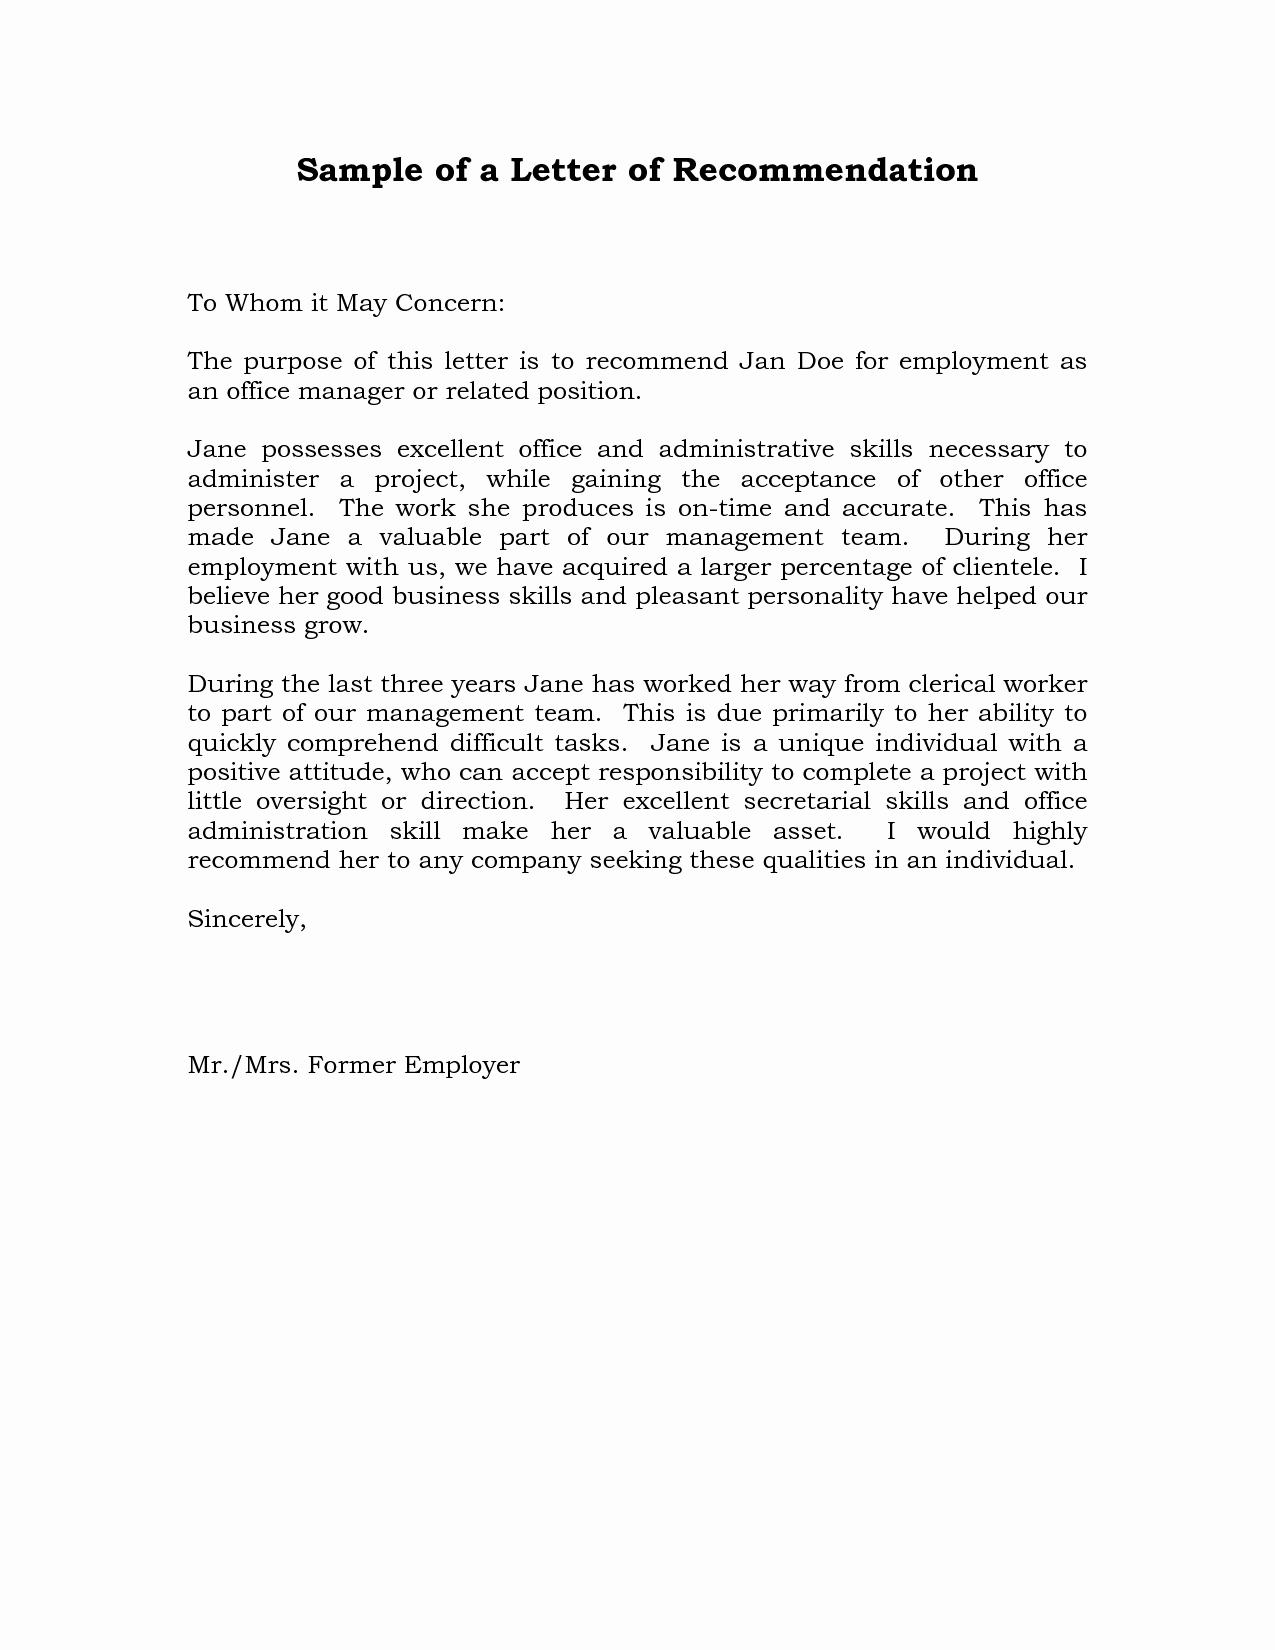 Simple Letter Of Recommendation Sample Elegant Reference Letter Of Re Mendation Sample